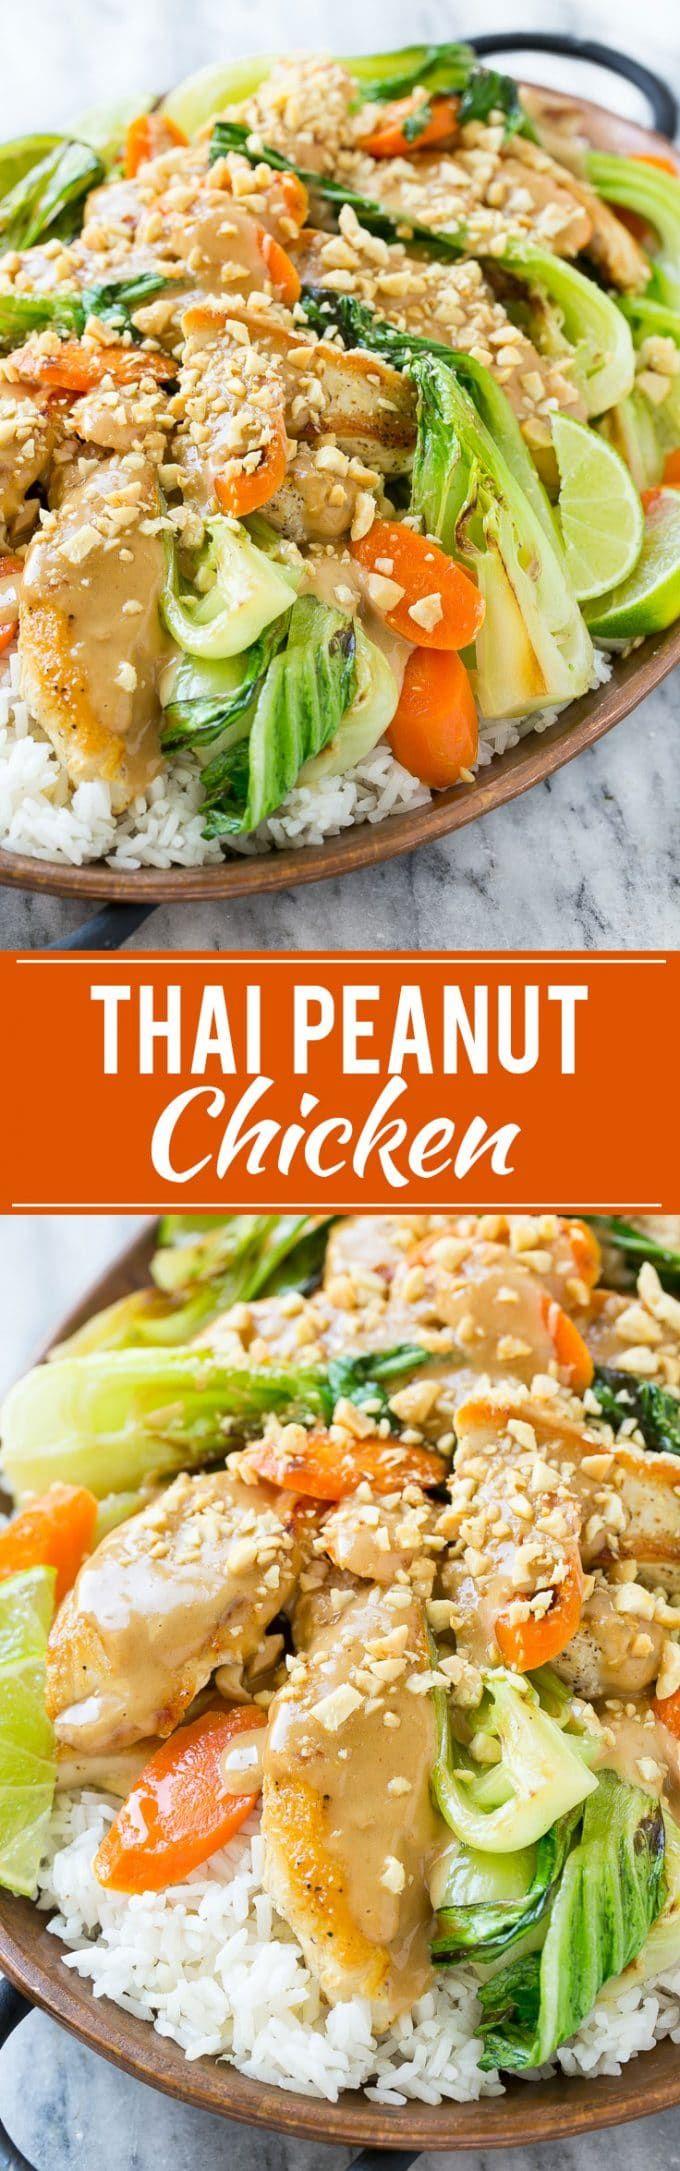 Thai Peanut Chicken | Thai Chicken Recipe | Peanut Sauce Recipe